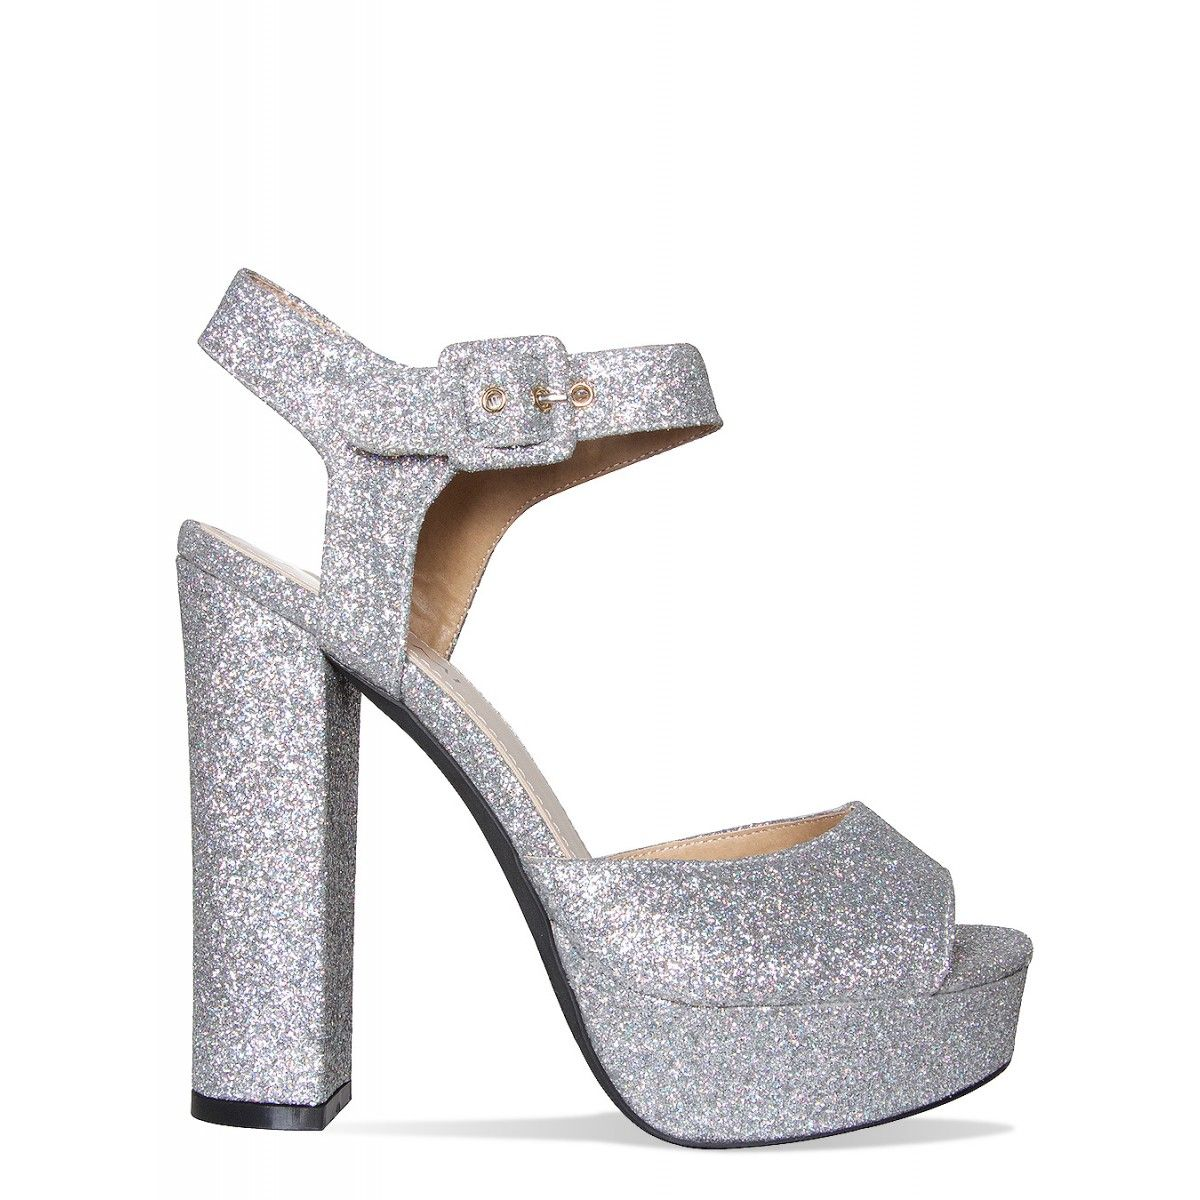 Nessa Silver Glitter Platform Heels : Simmi Shoes | Inspiration ...